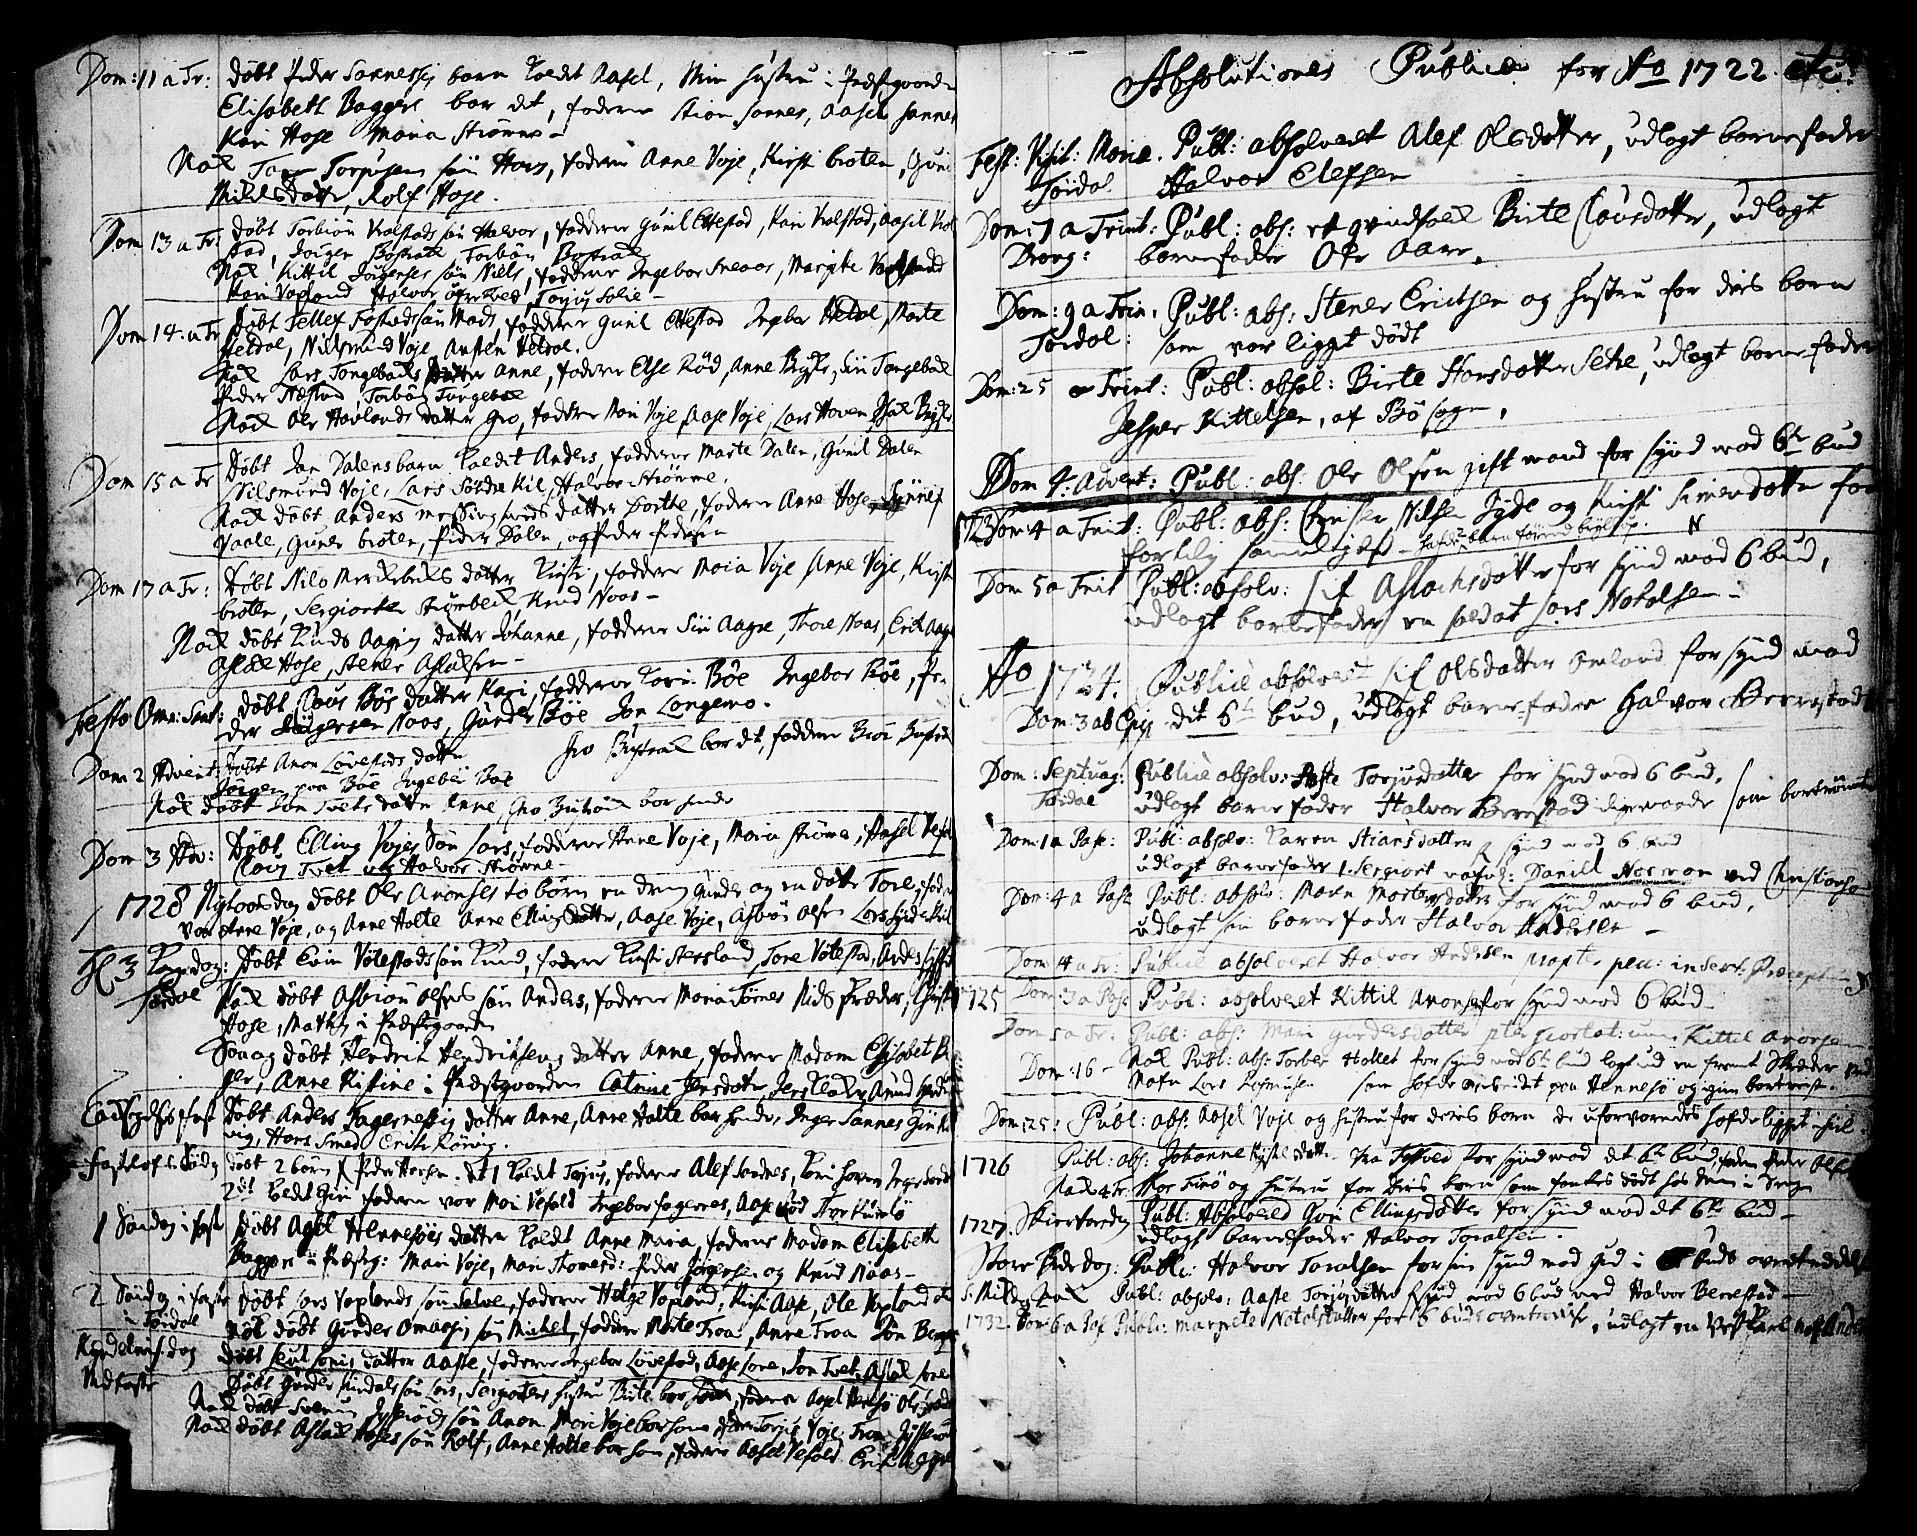 SAKO, Drangedal kirkebøker, F/Fa/L0001: Ministerialbok nr. 1, 1697-1767, s. 50